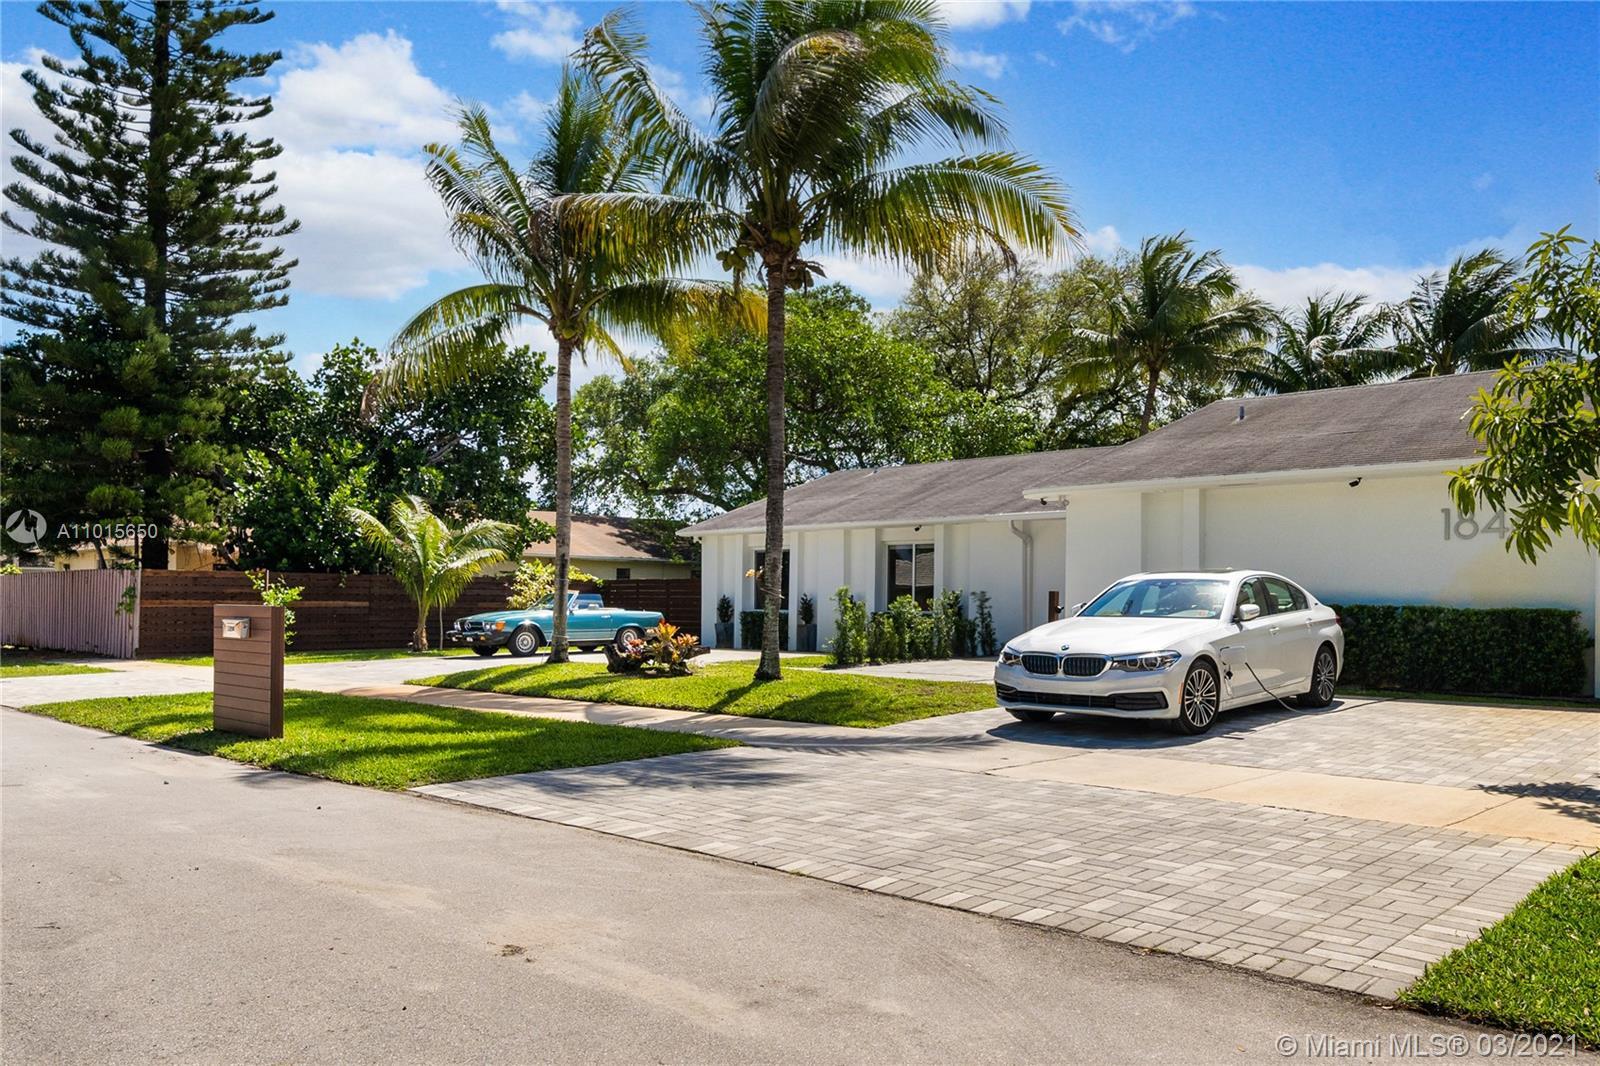 Highland Lakes - 1846 NE 211th Ln, Miami, FL 33179